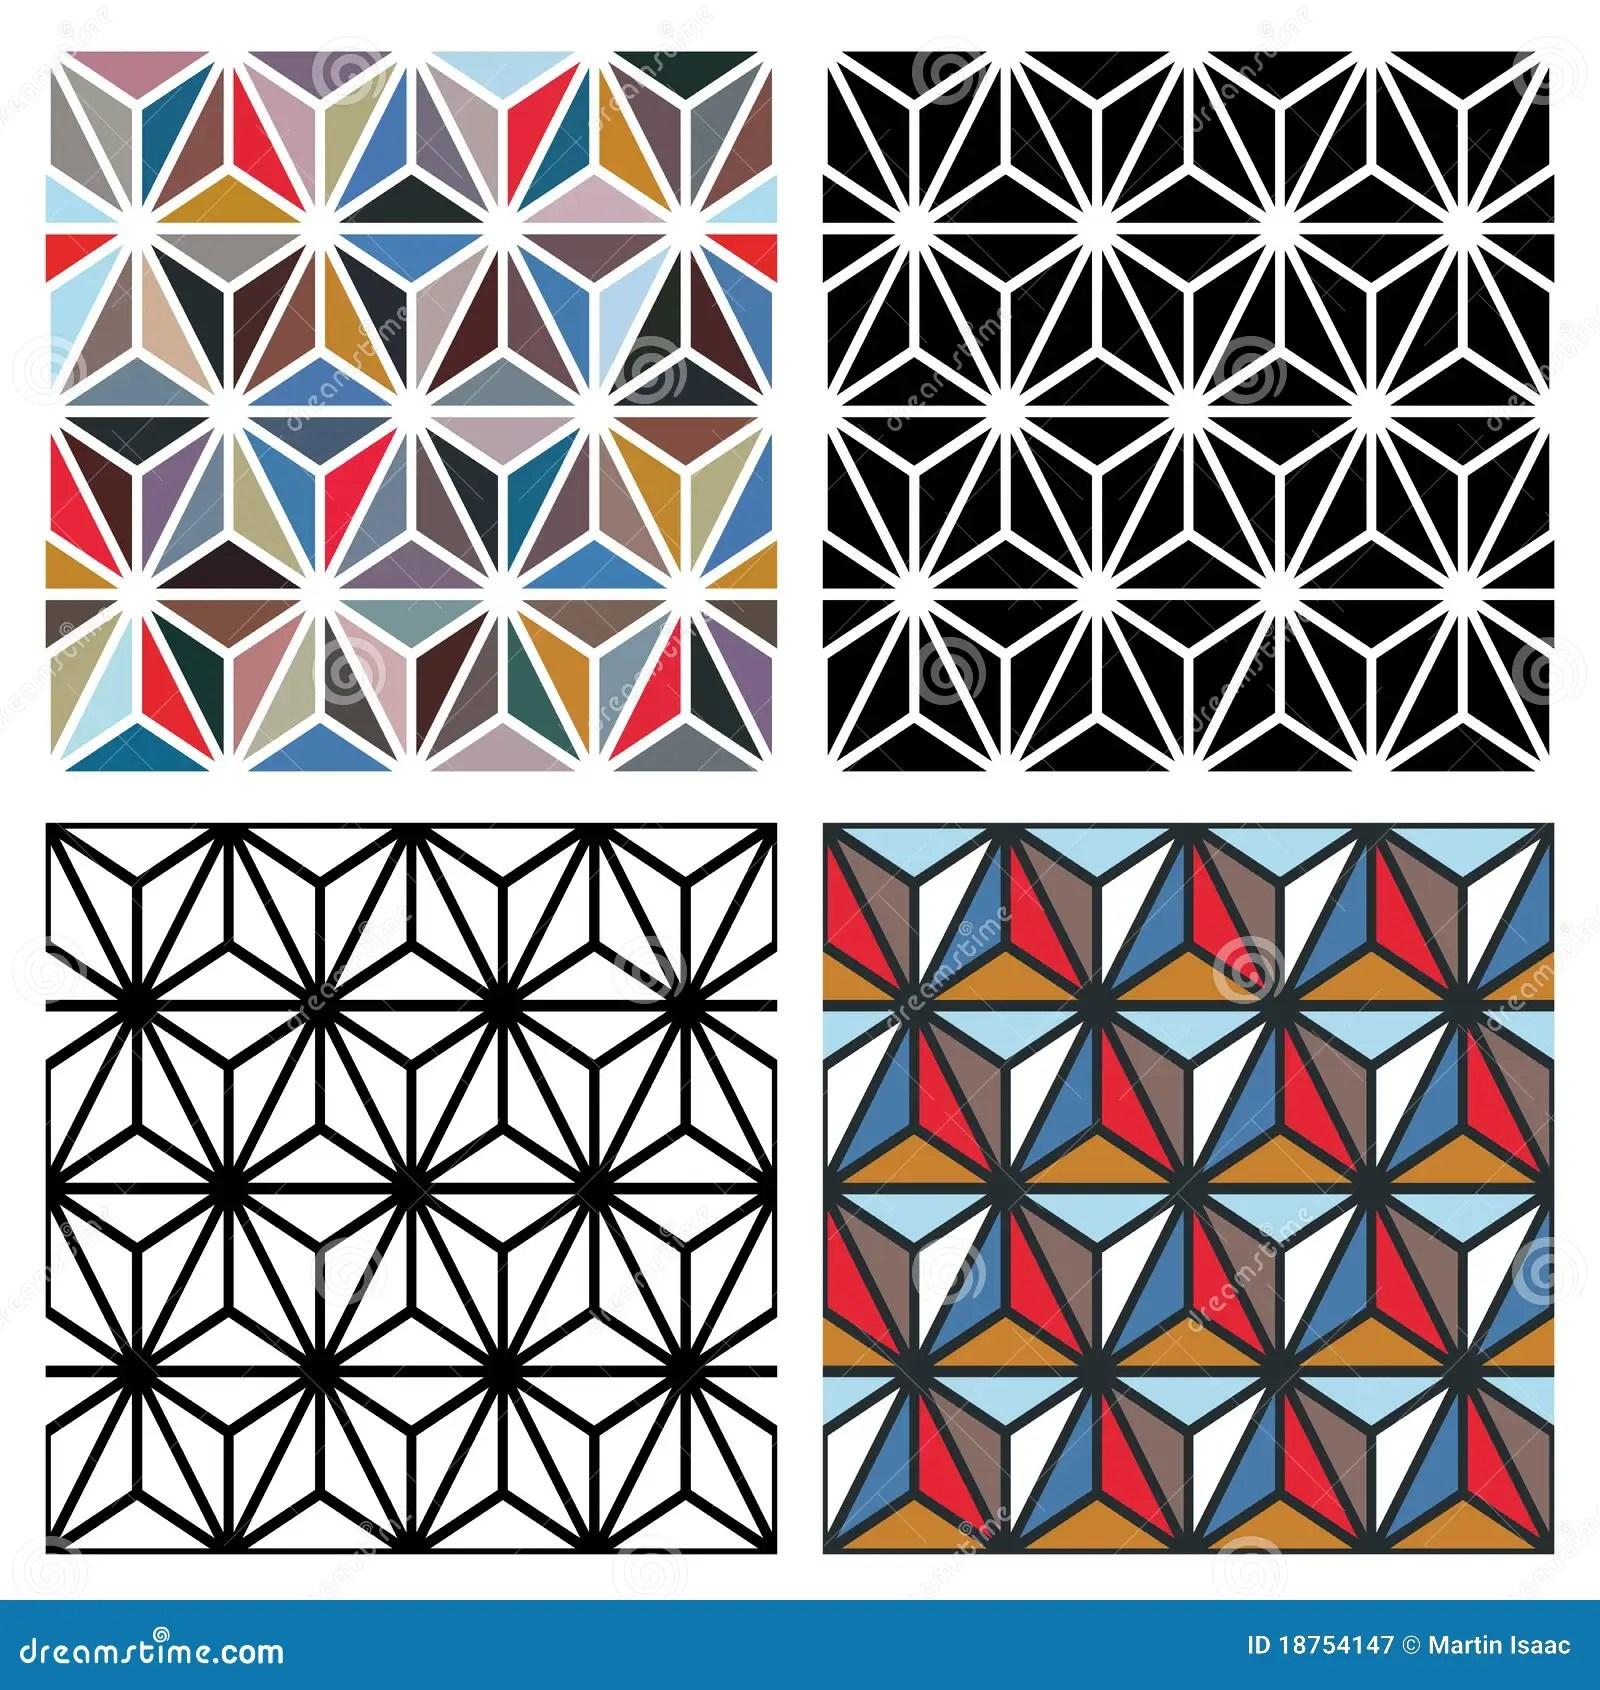 Tessellation Patterns Worksheets